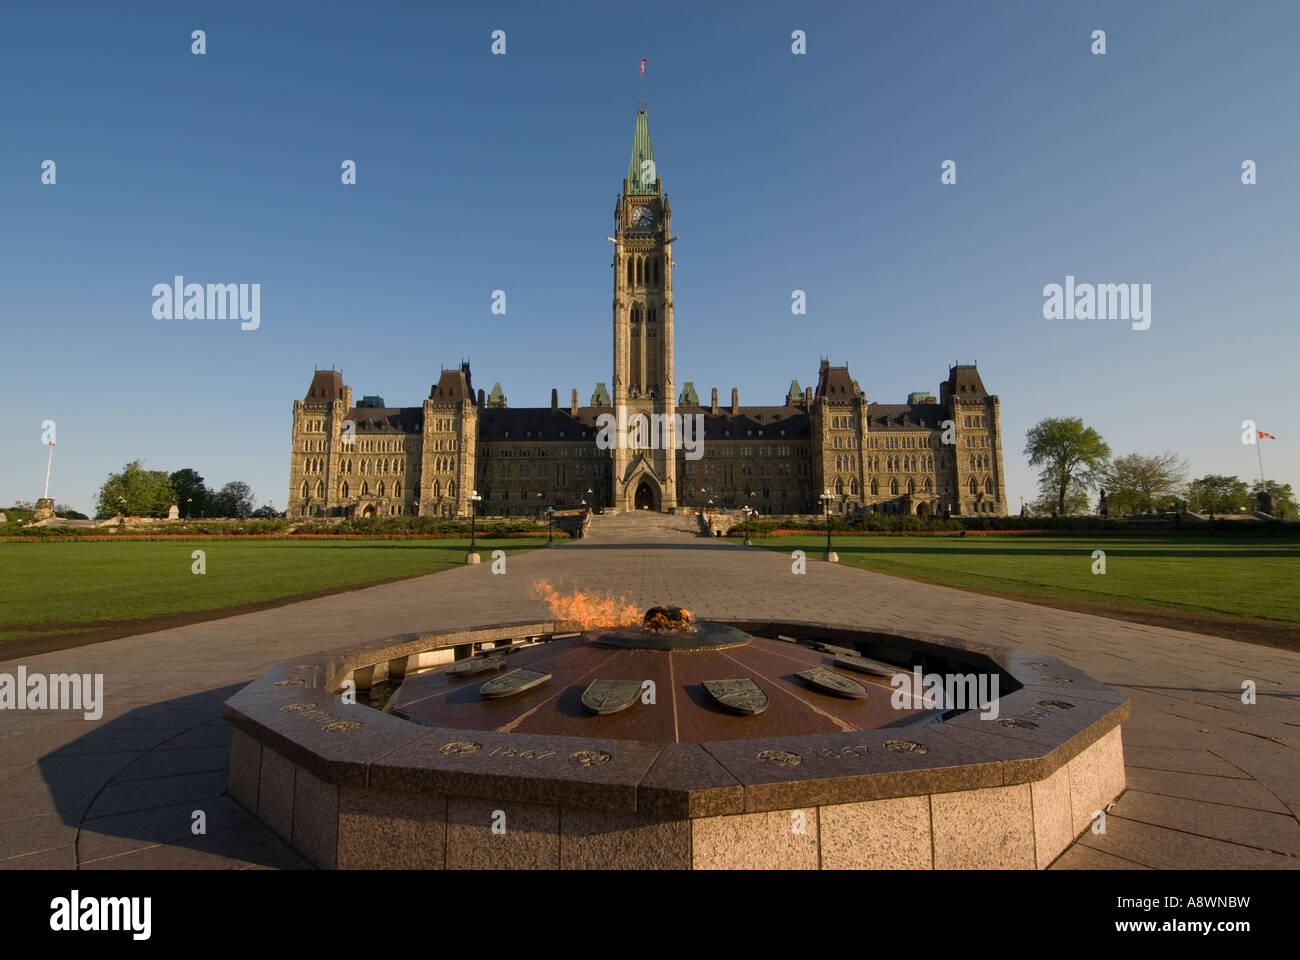 Centennial Flame on Parliament Hill Ottawa Ontario Canada Stock ...